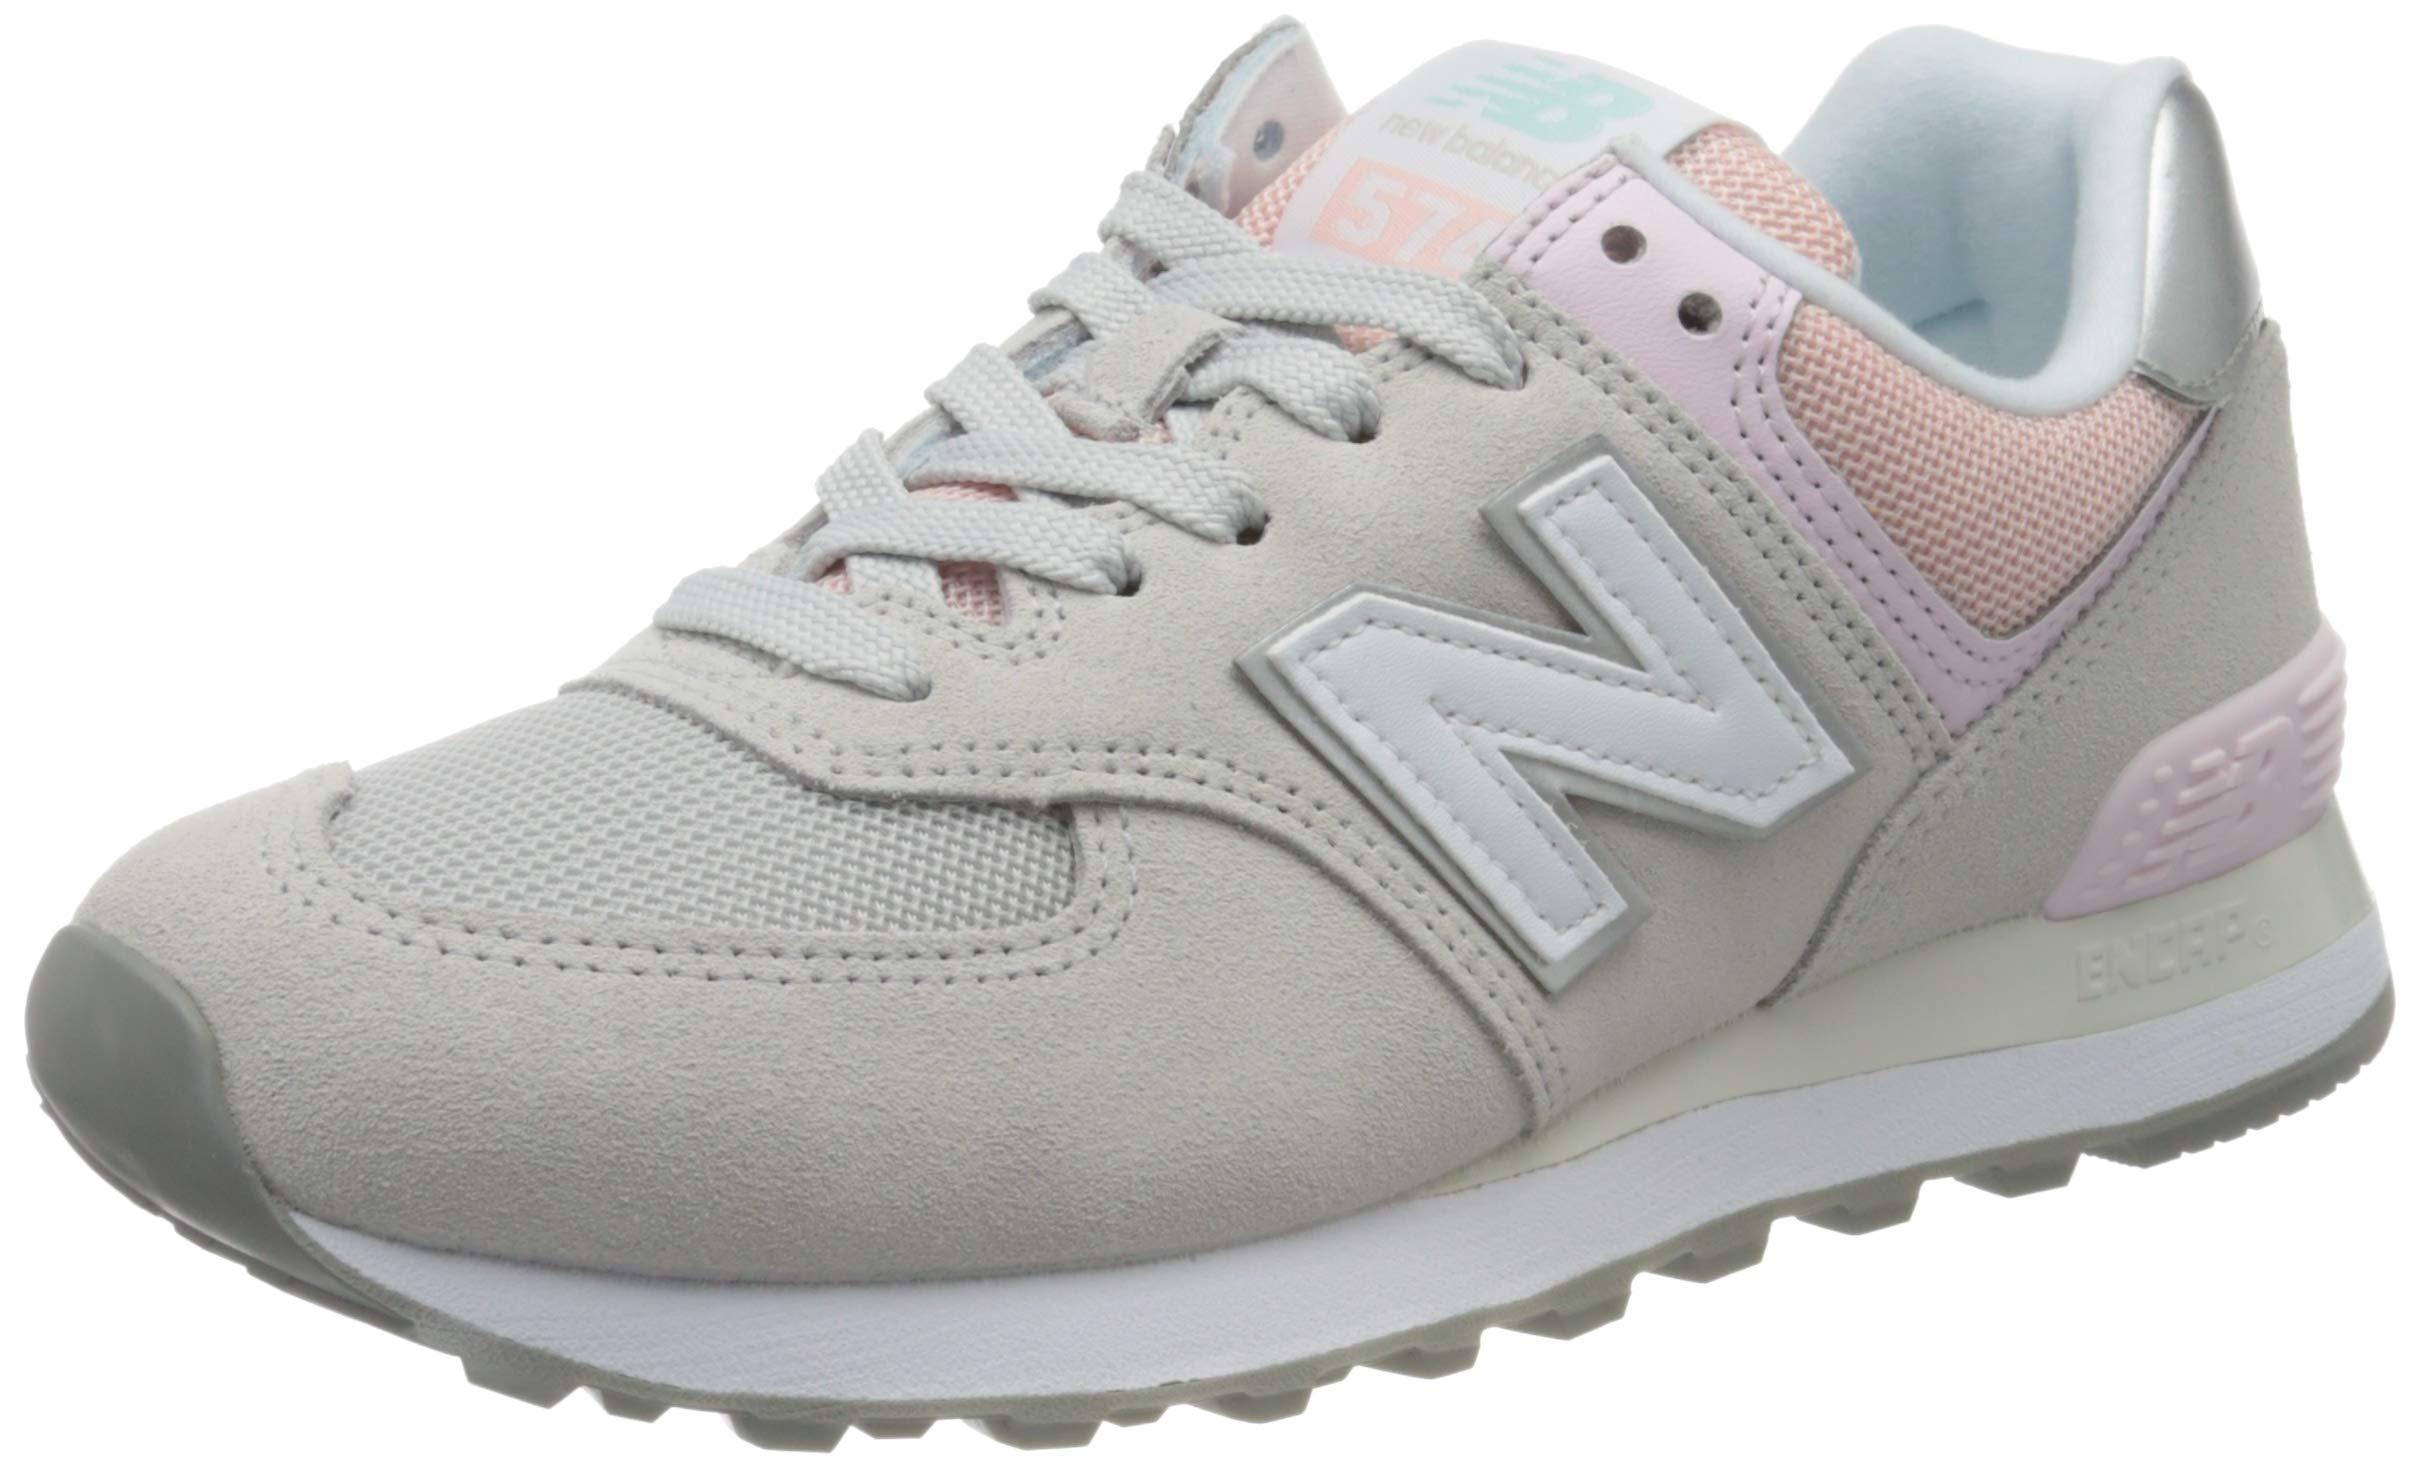 New Balance Women's Iconic 574 Sneaker